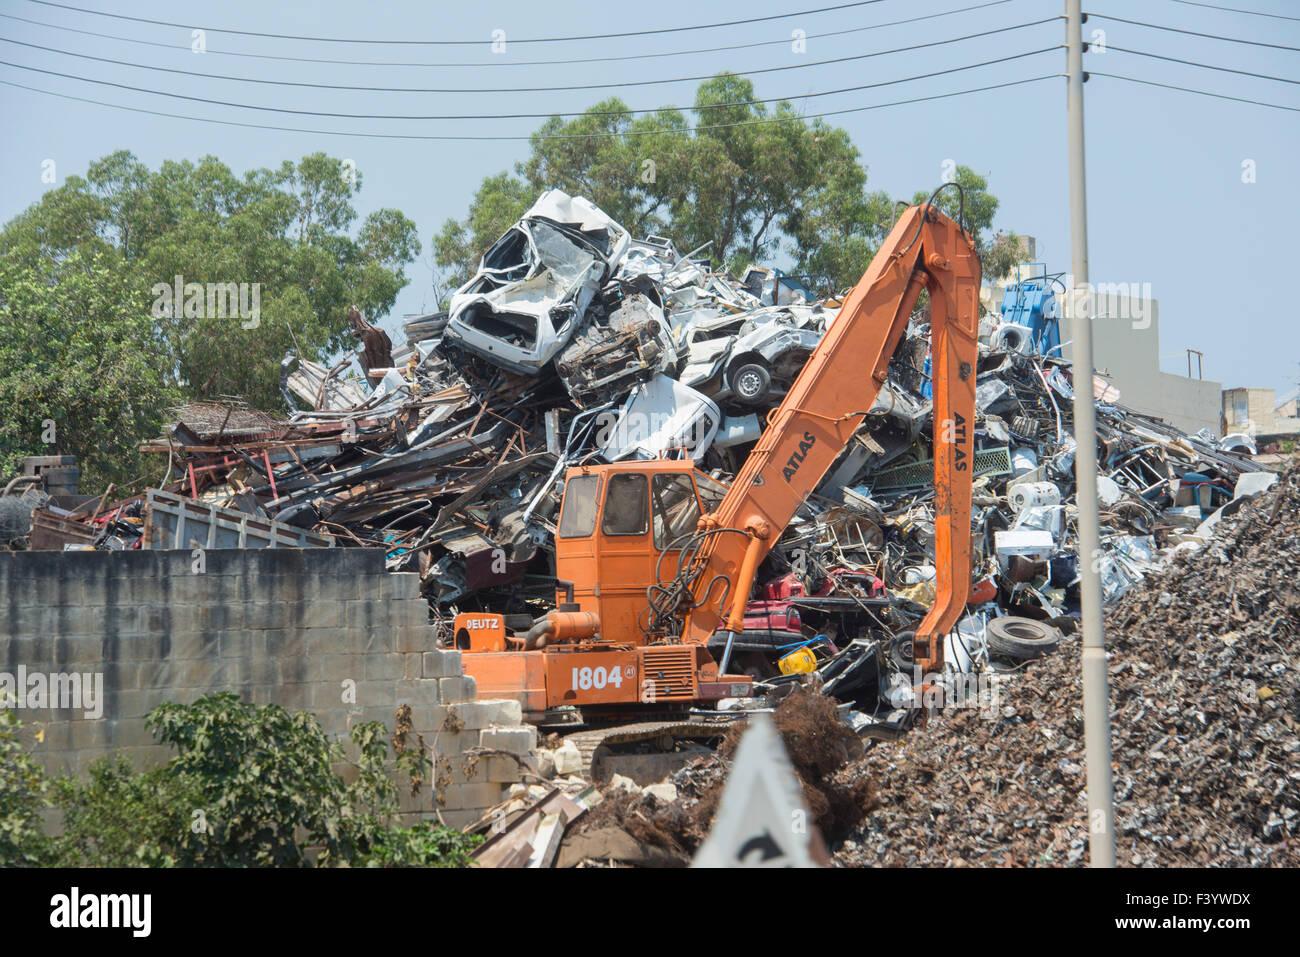 Crushed cars in scrap metal recycling yard in Malta. - Stock Image